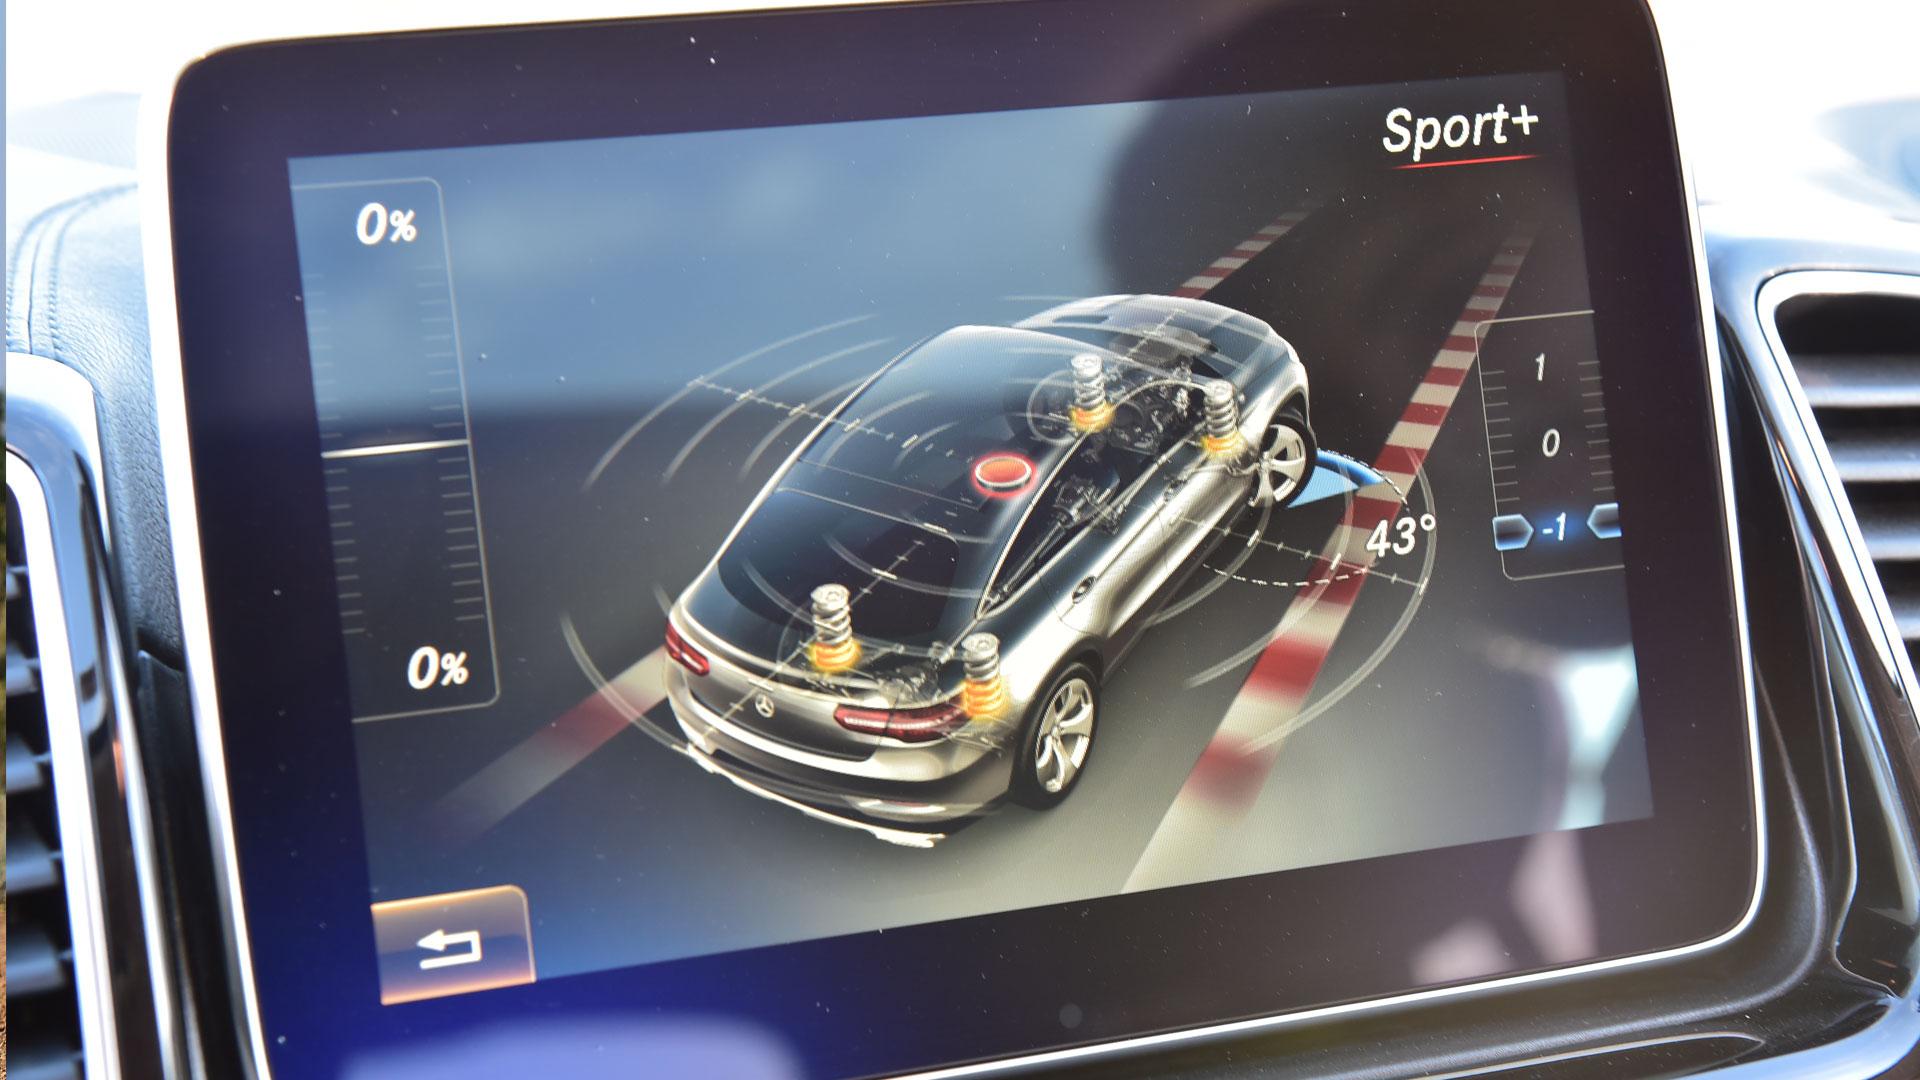 Mercedes Benz GLE 2016 450 AMG Coupe Interior